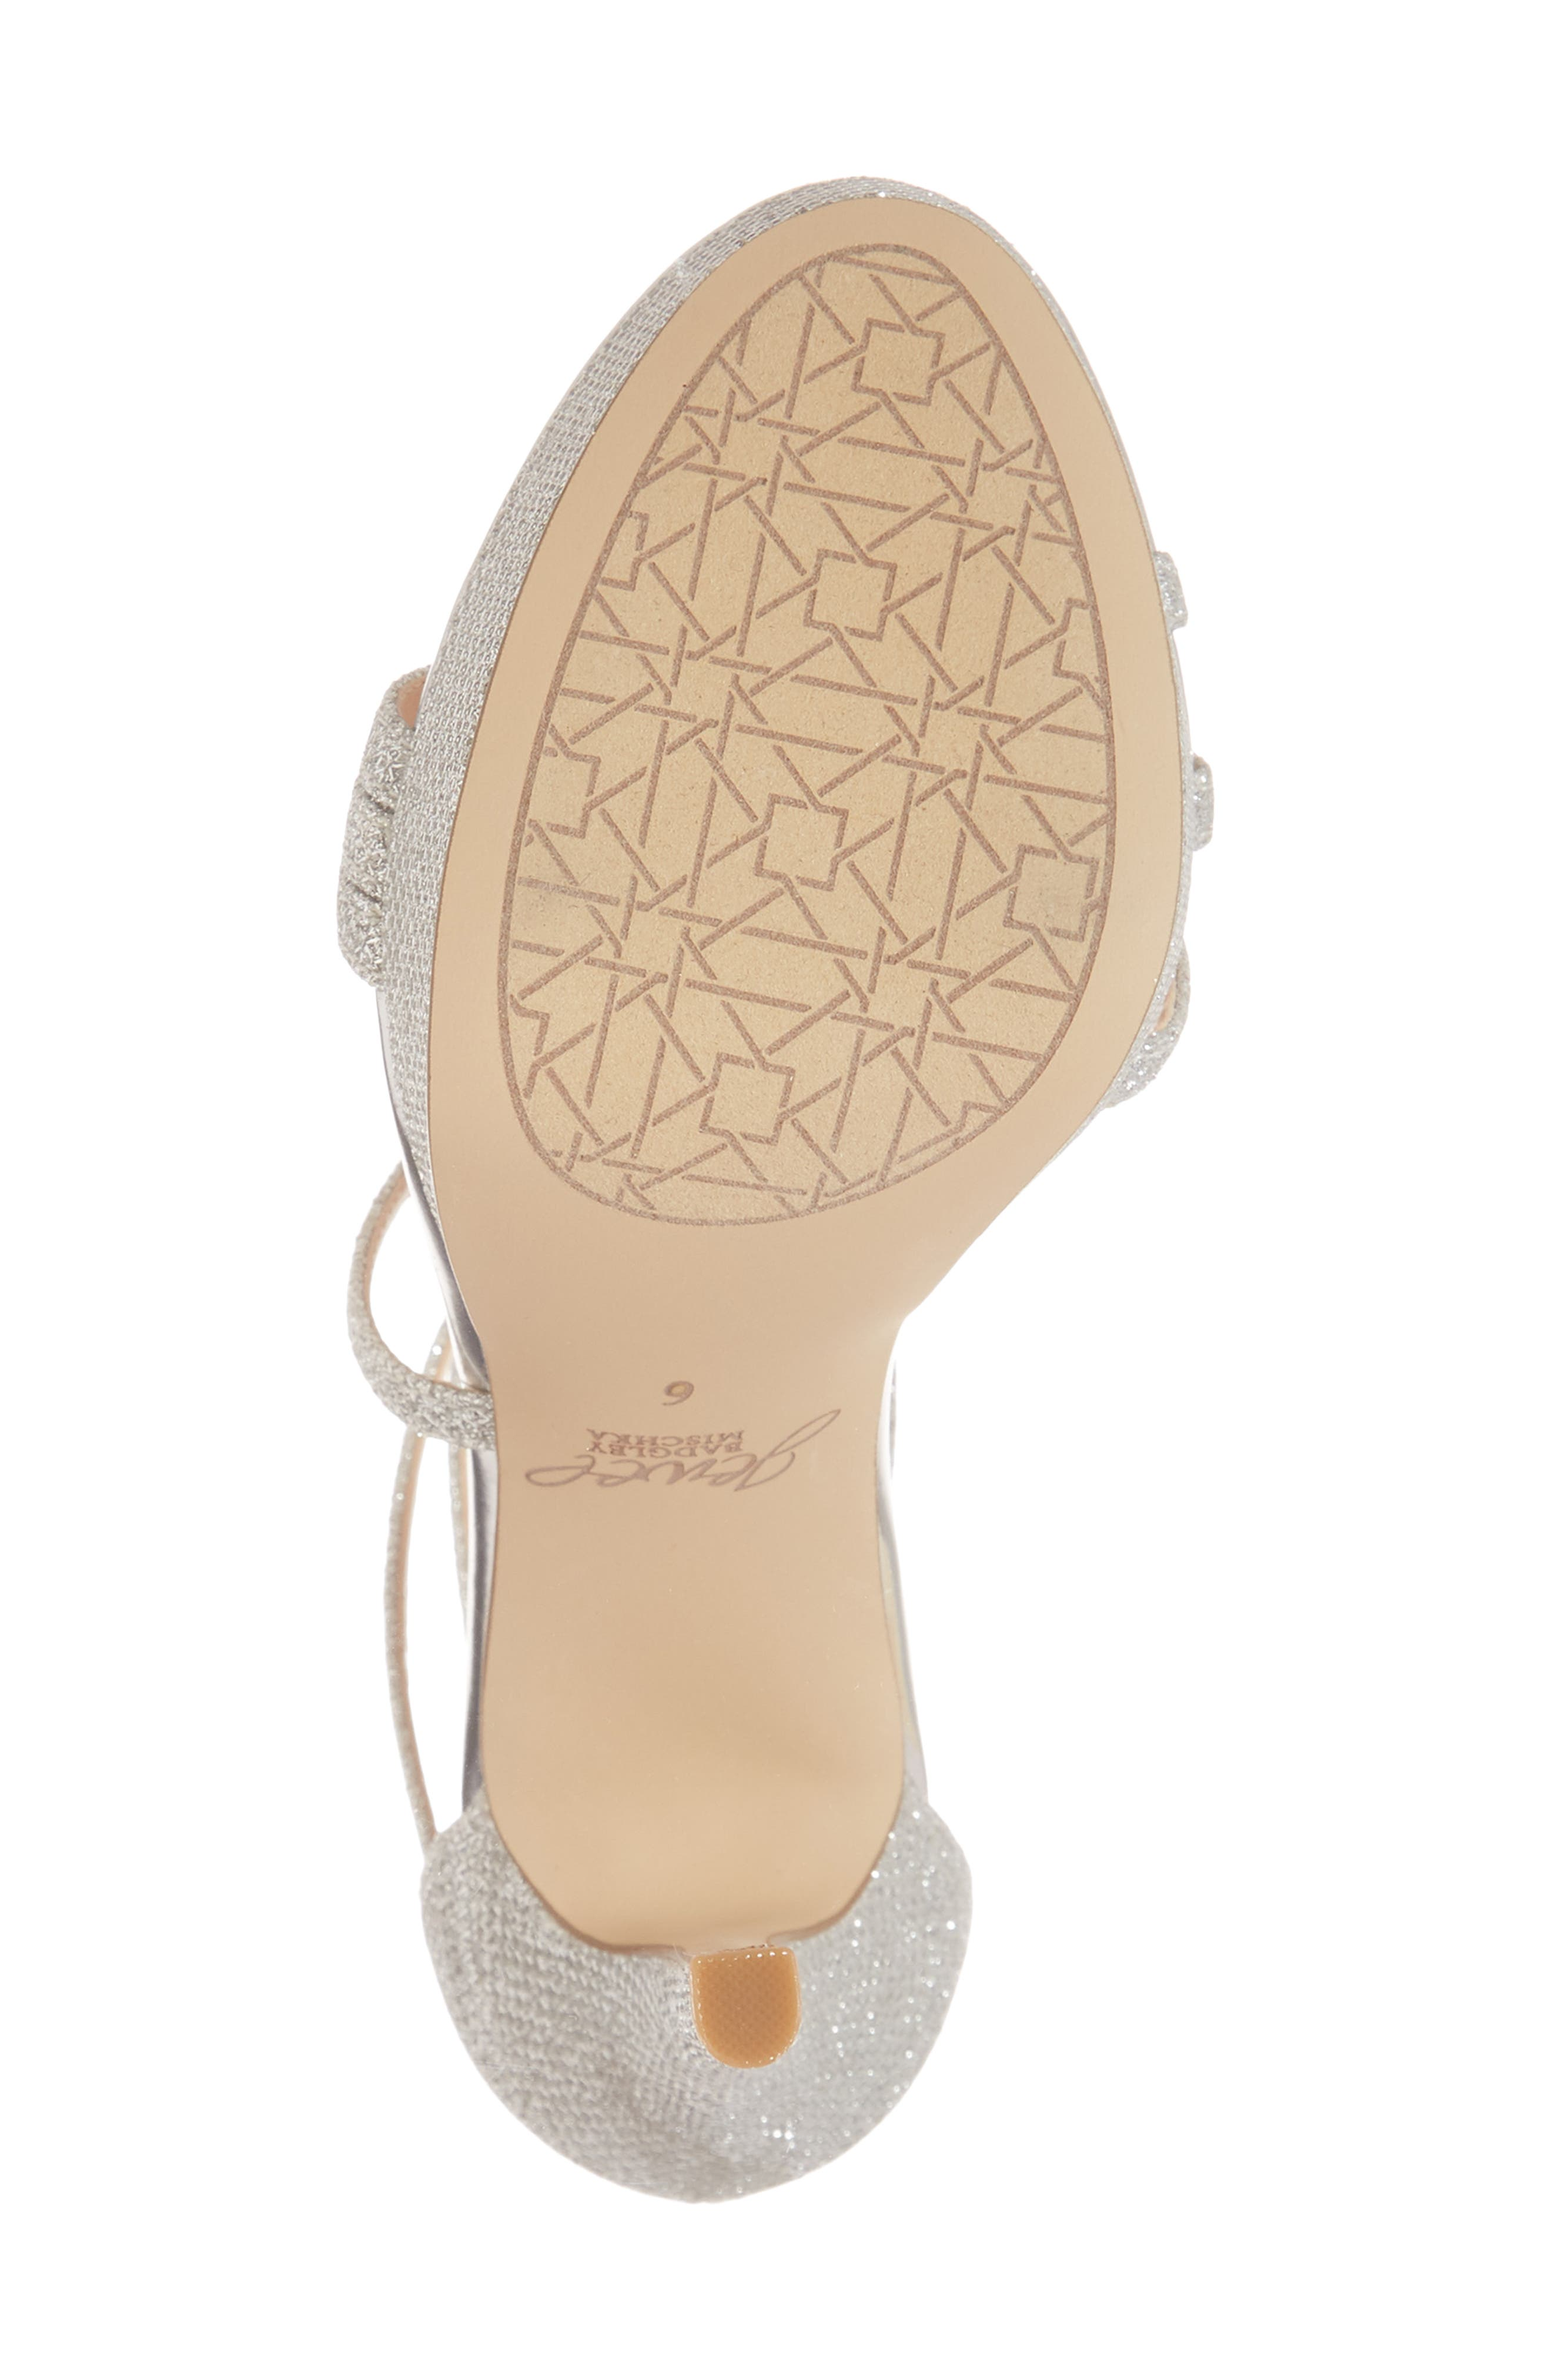 Maeva Platform Sandal,                             Alternate thumbnail 6, color,                             SILVER GLITTER FABRIC